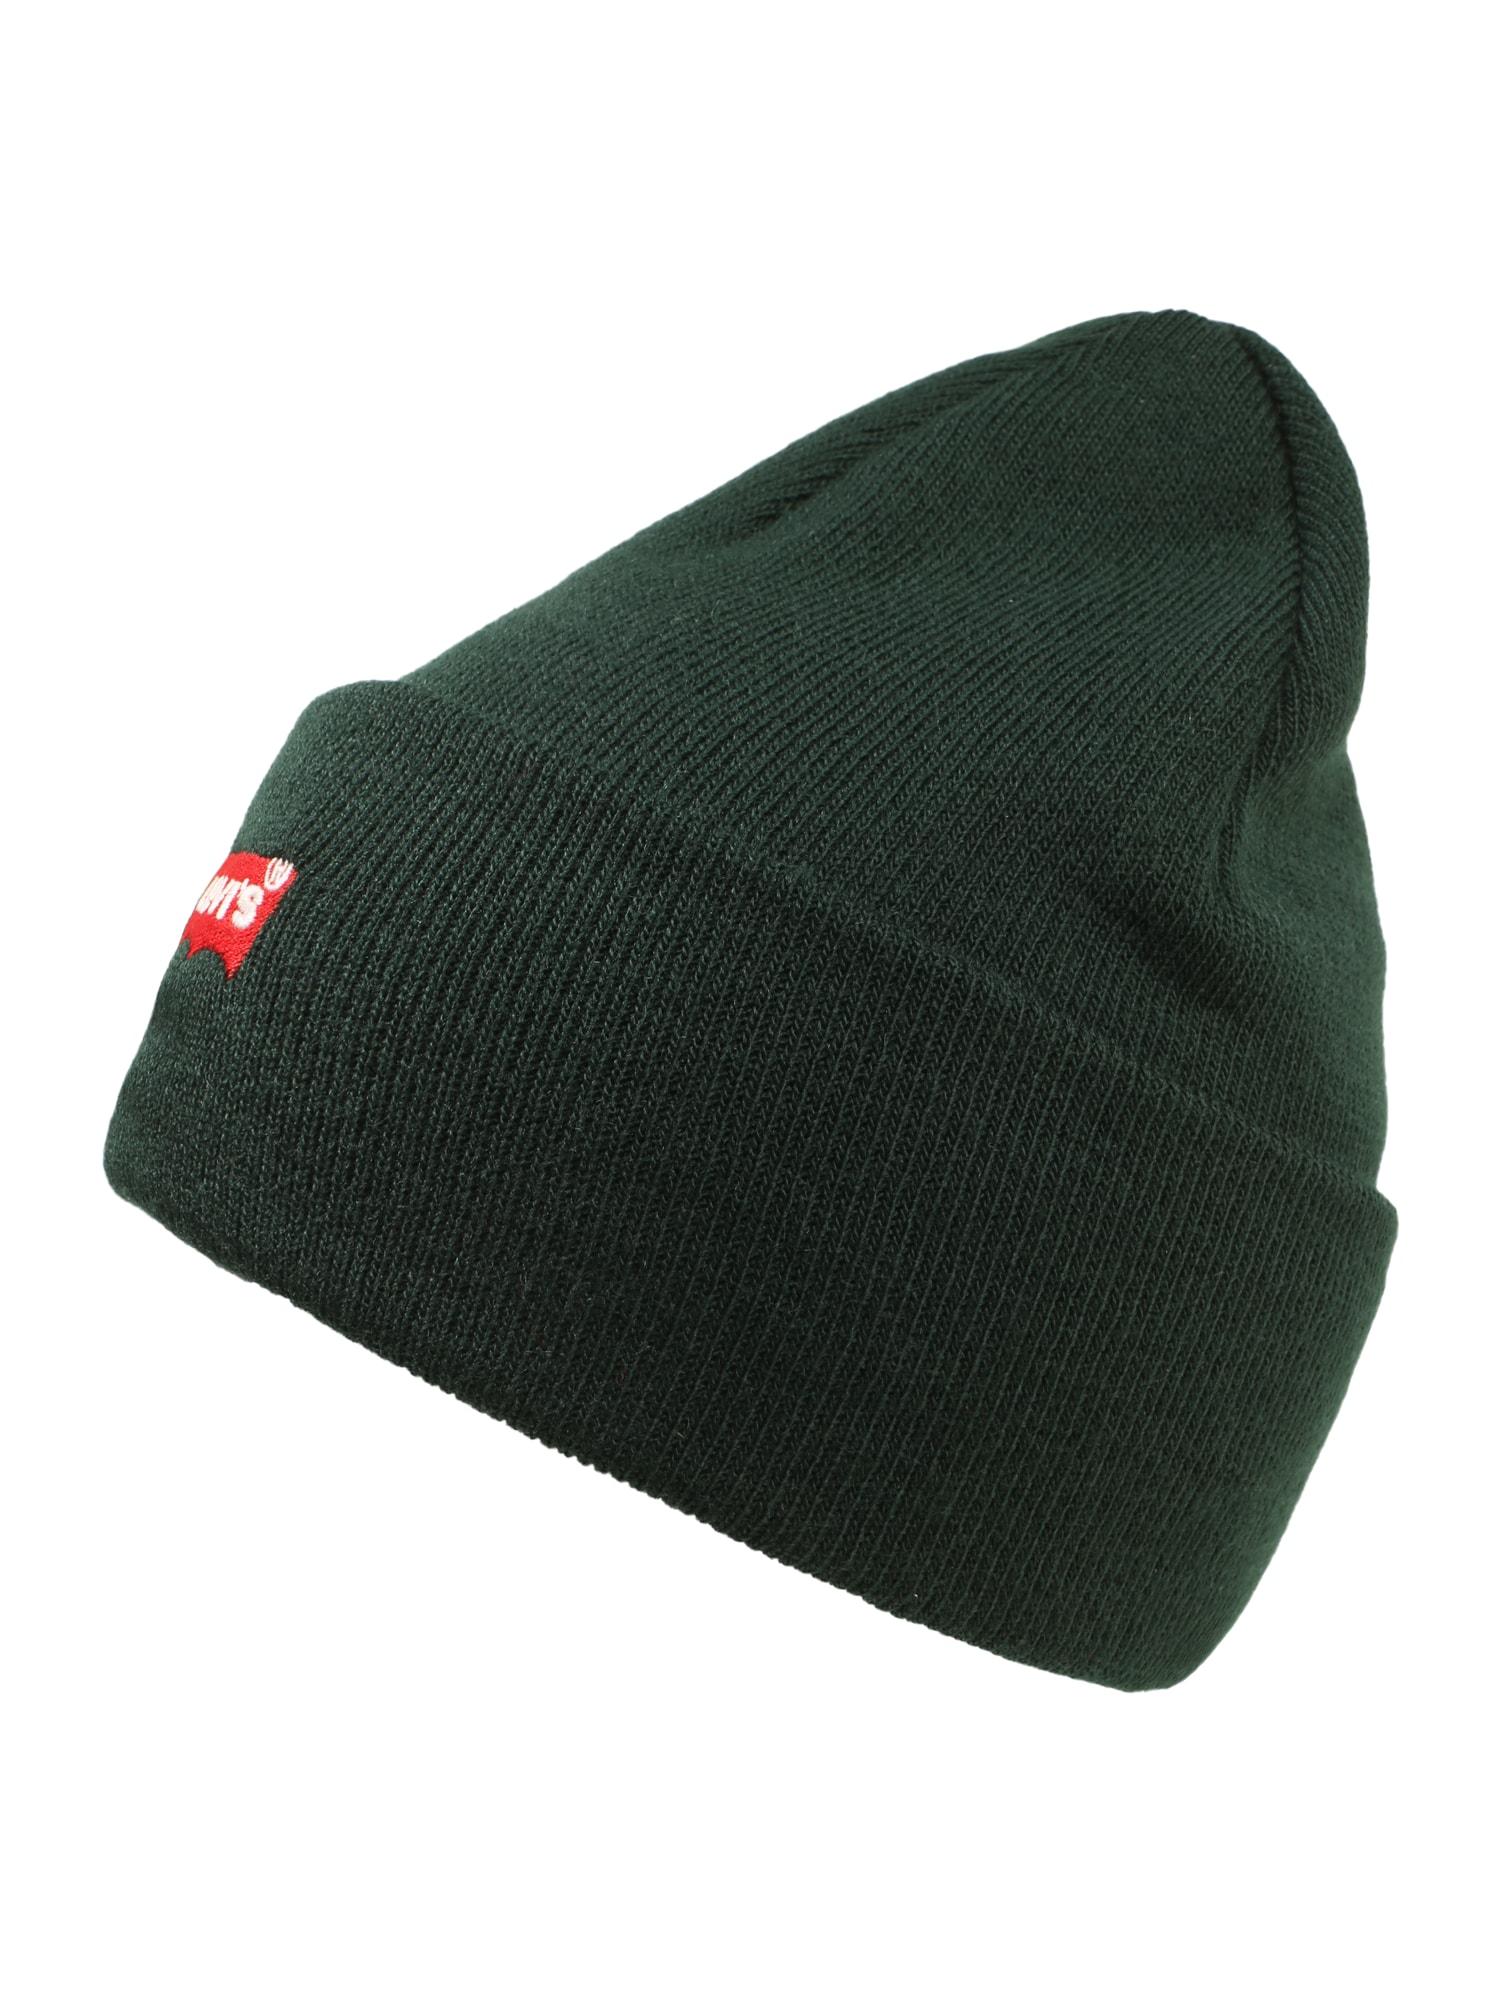 LEVI'S Megzta kepurė 'RED BATWING EMBROIDERED SLOUCHY BEANIE' tamsiai žalia